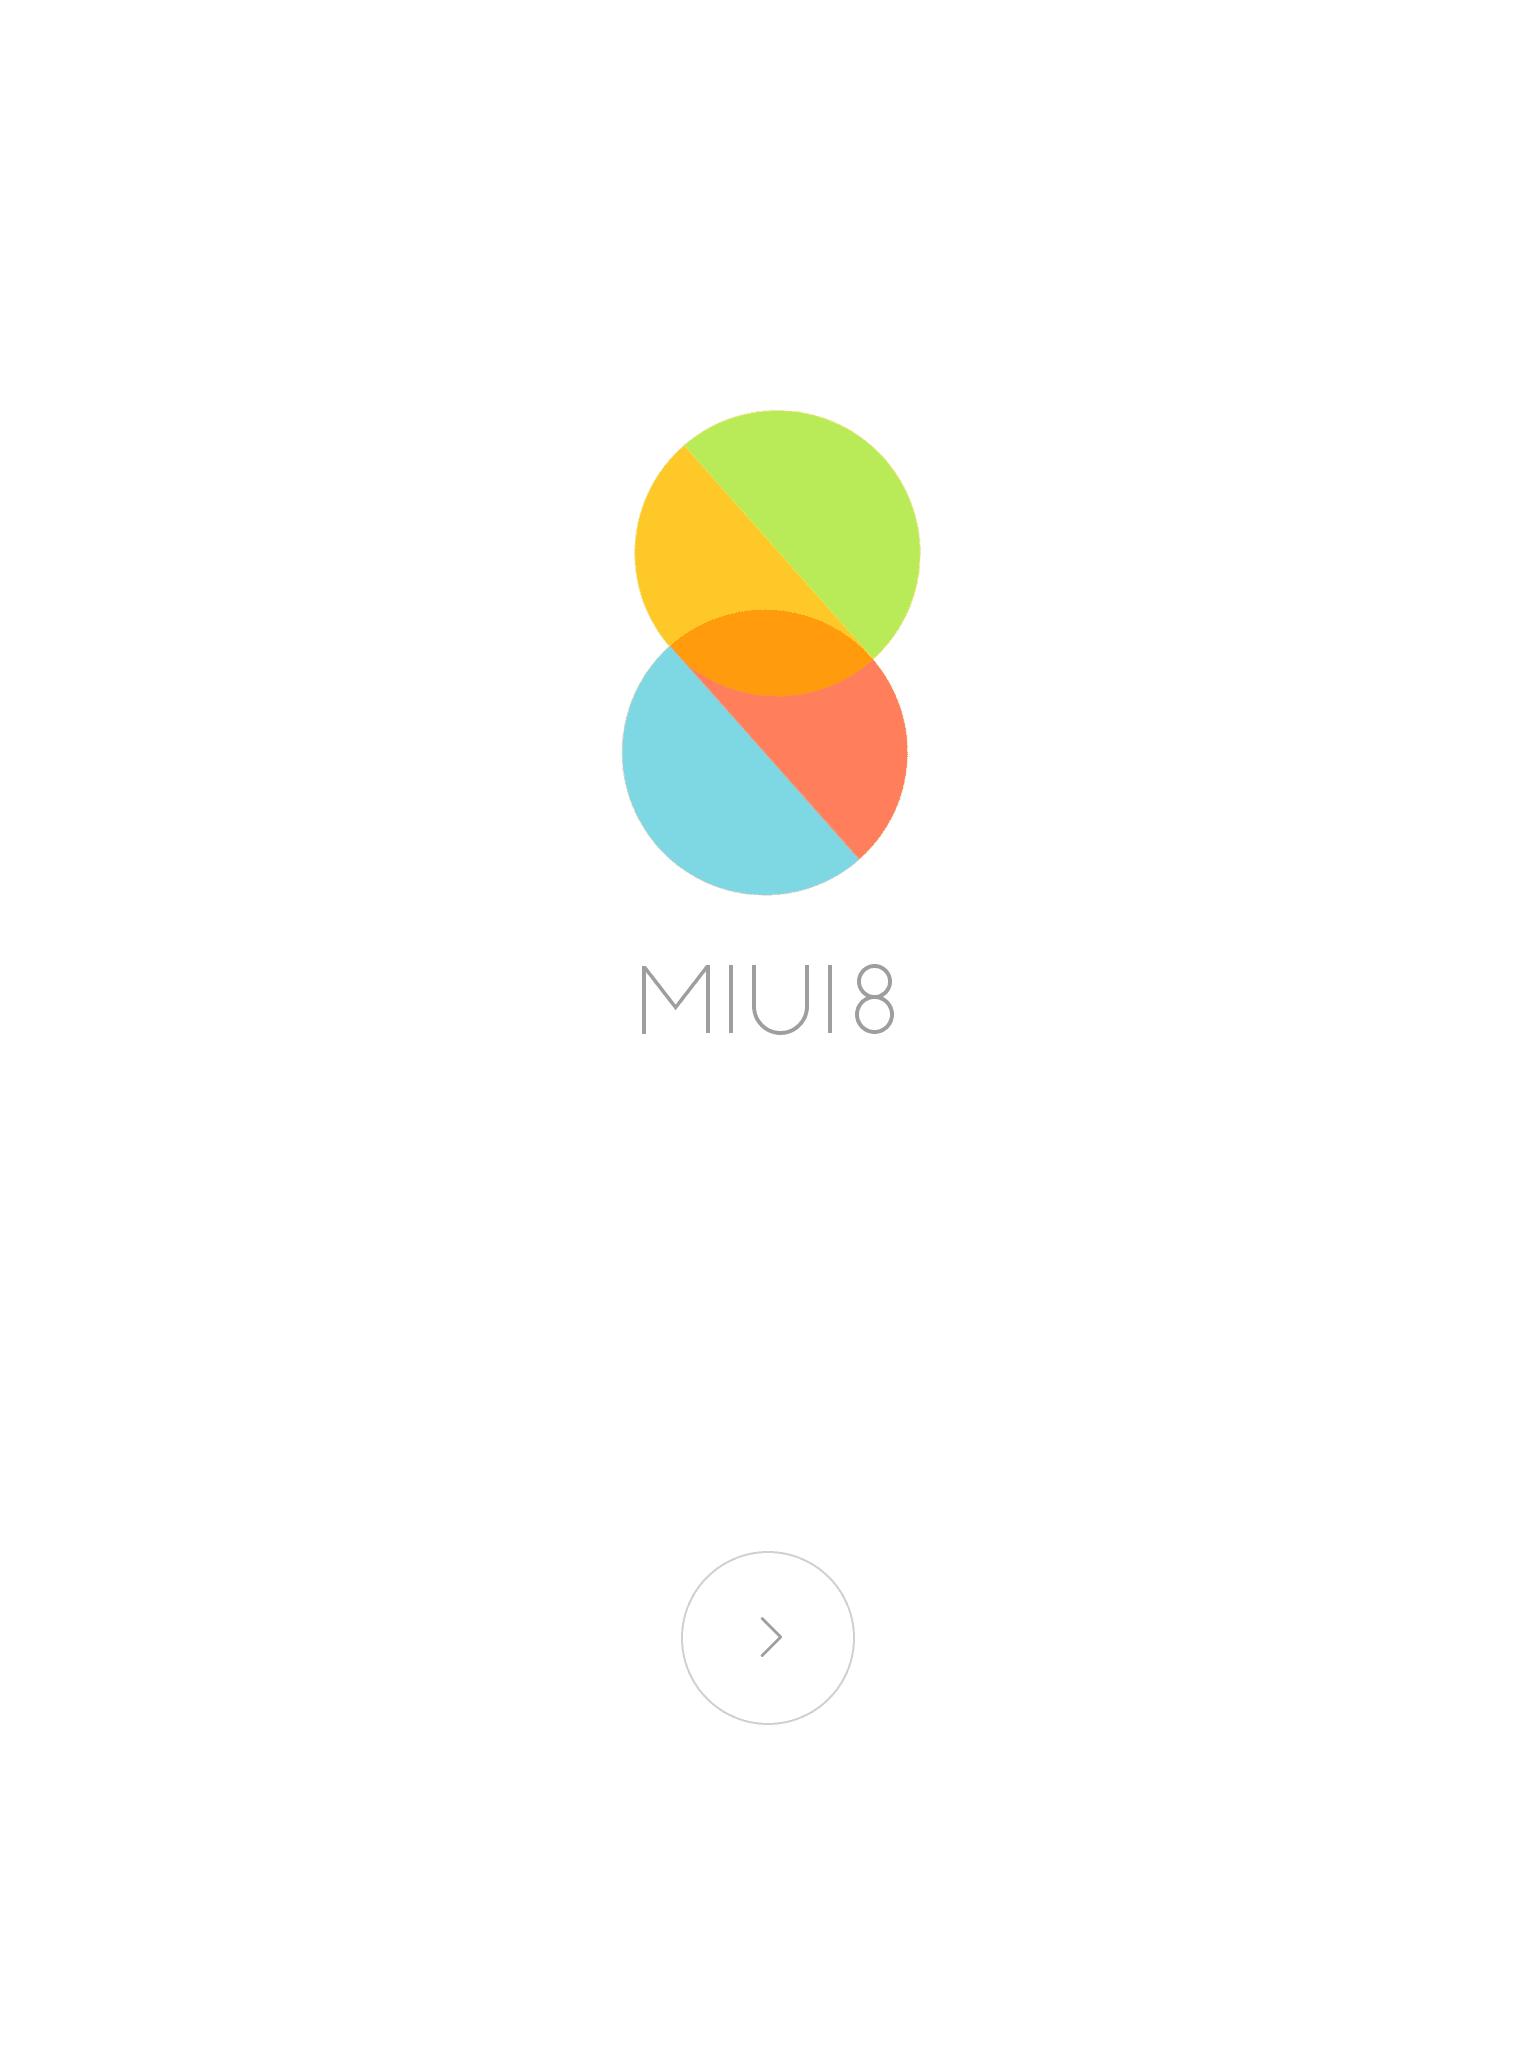 Xiaomi Mi Pad 3 Test – das ideale Tablet für Couch-Potatoes 7 techboys.de • smarte News, auf den Punkt! Xiaomi Mi Pad 3 Test – das ideale Tablet für Couch-Potatoes